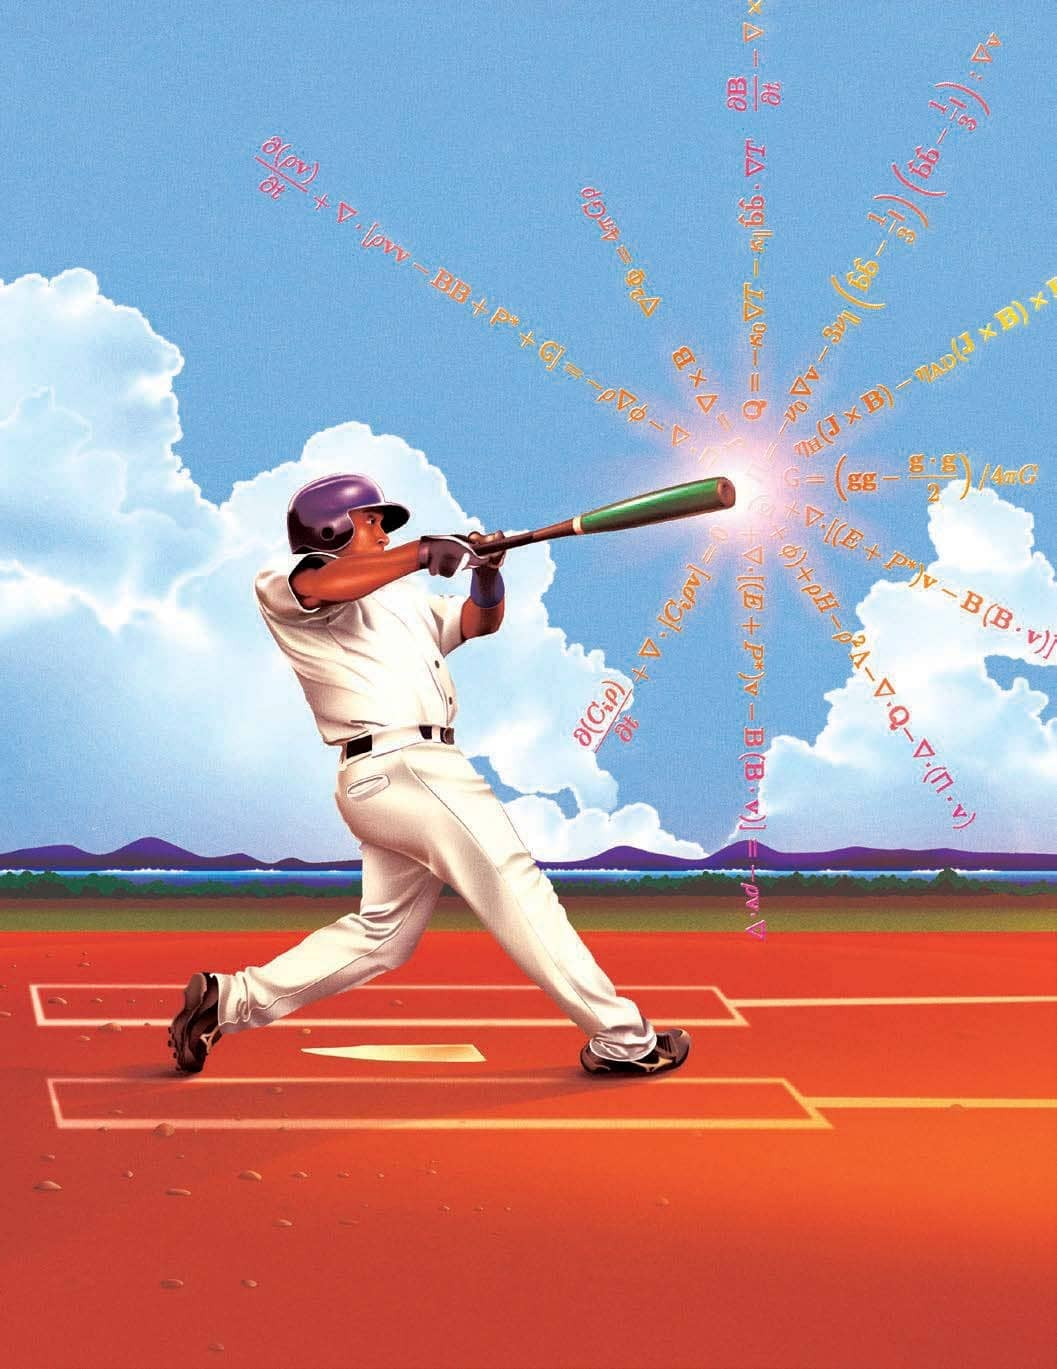 A Losing Equation For Baseball